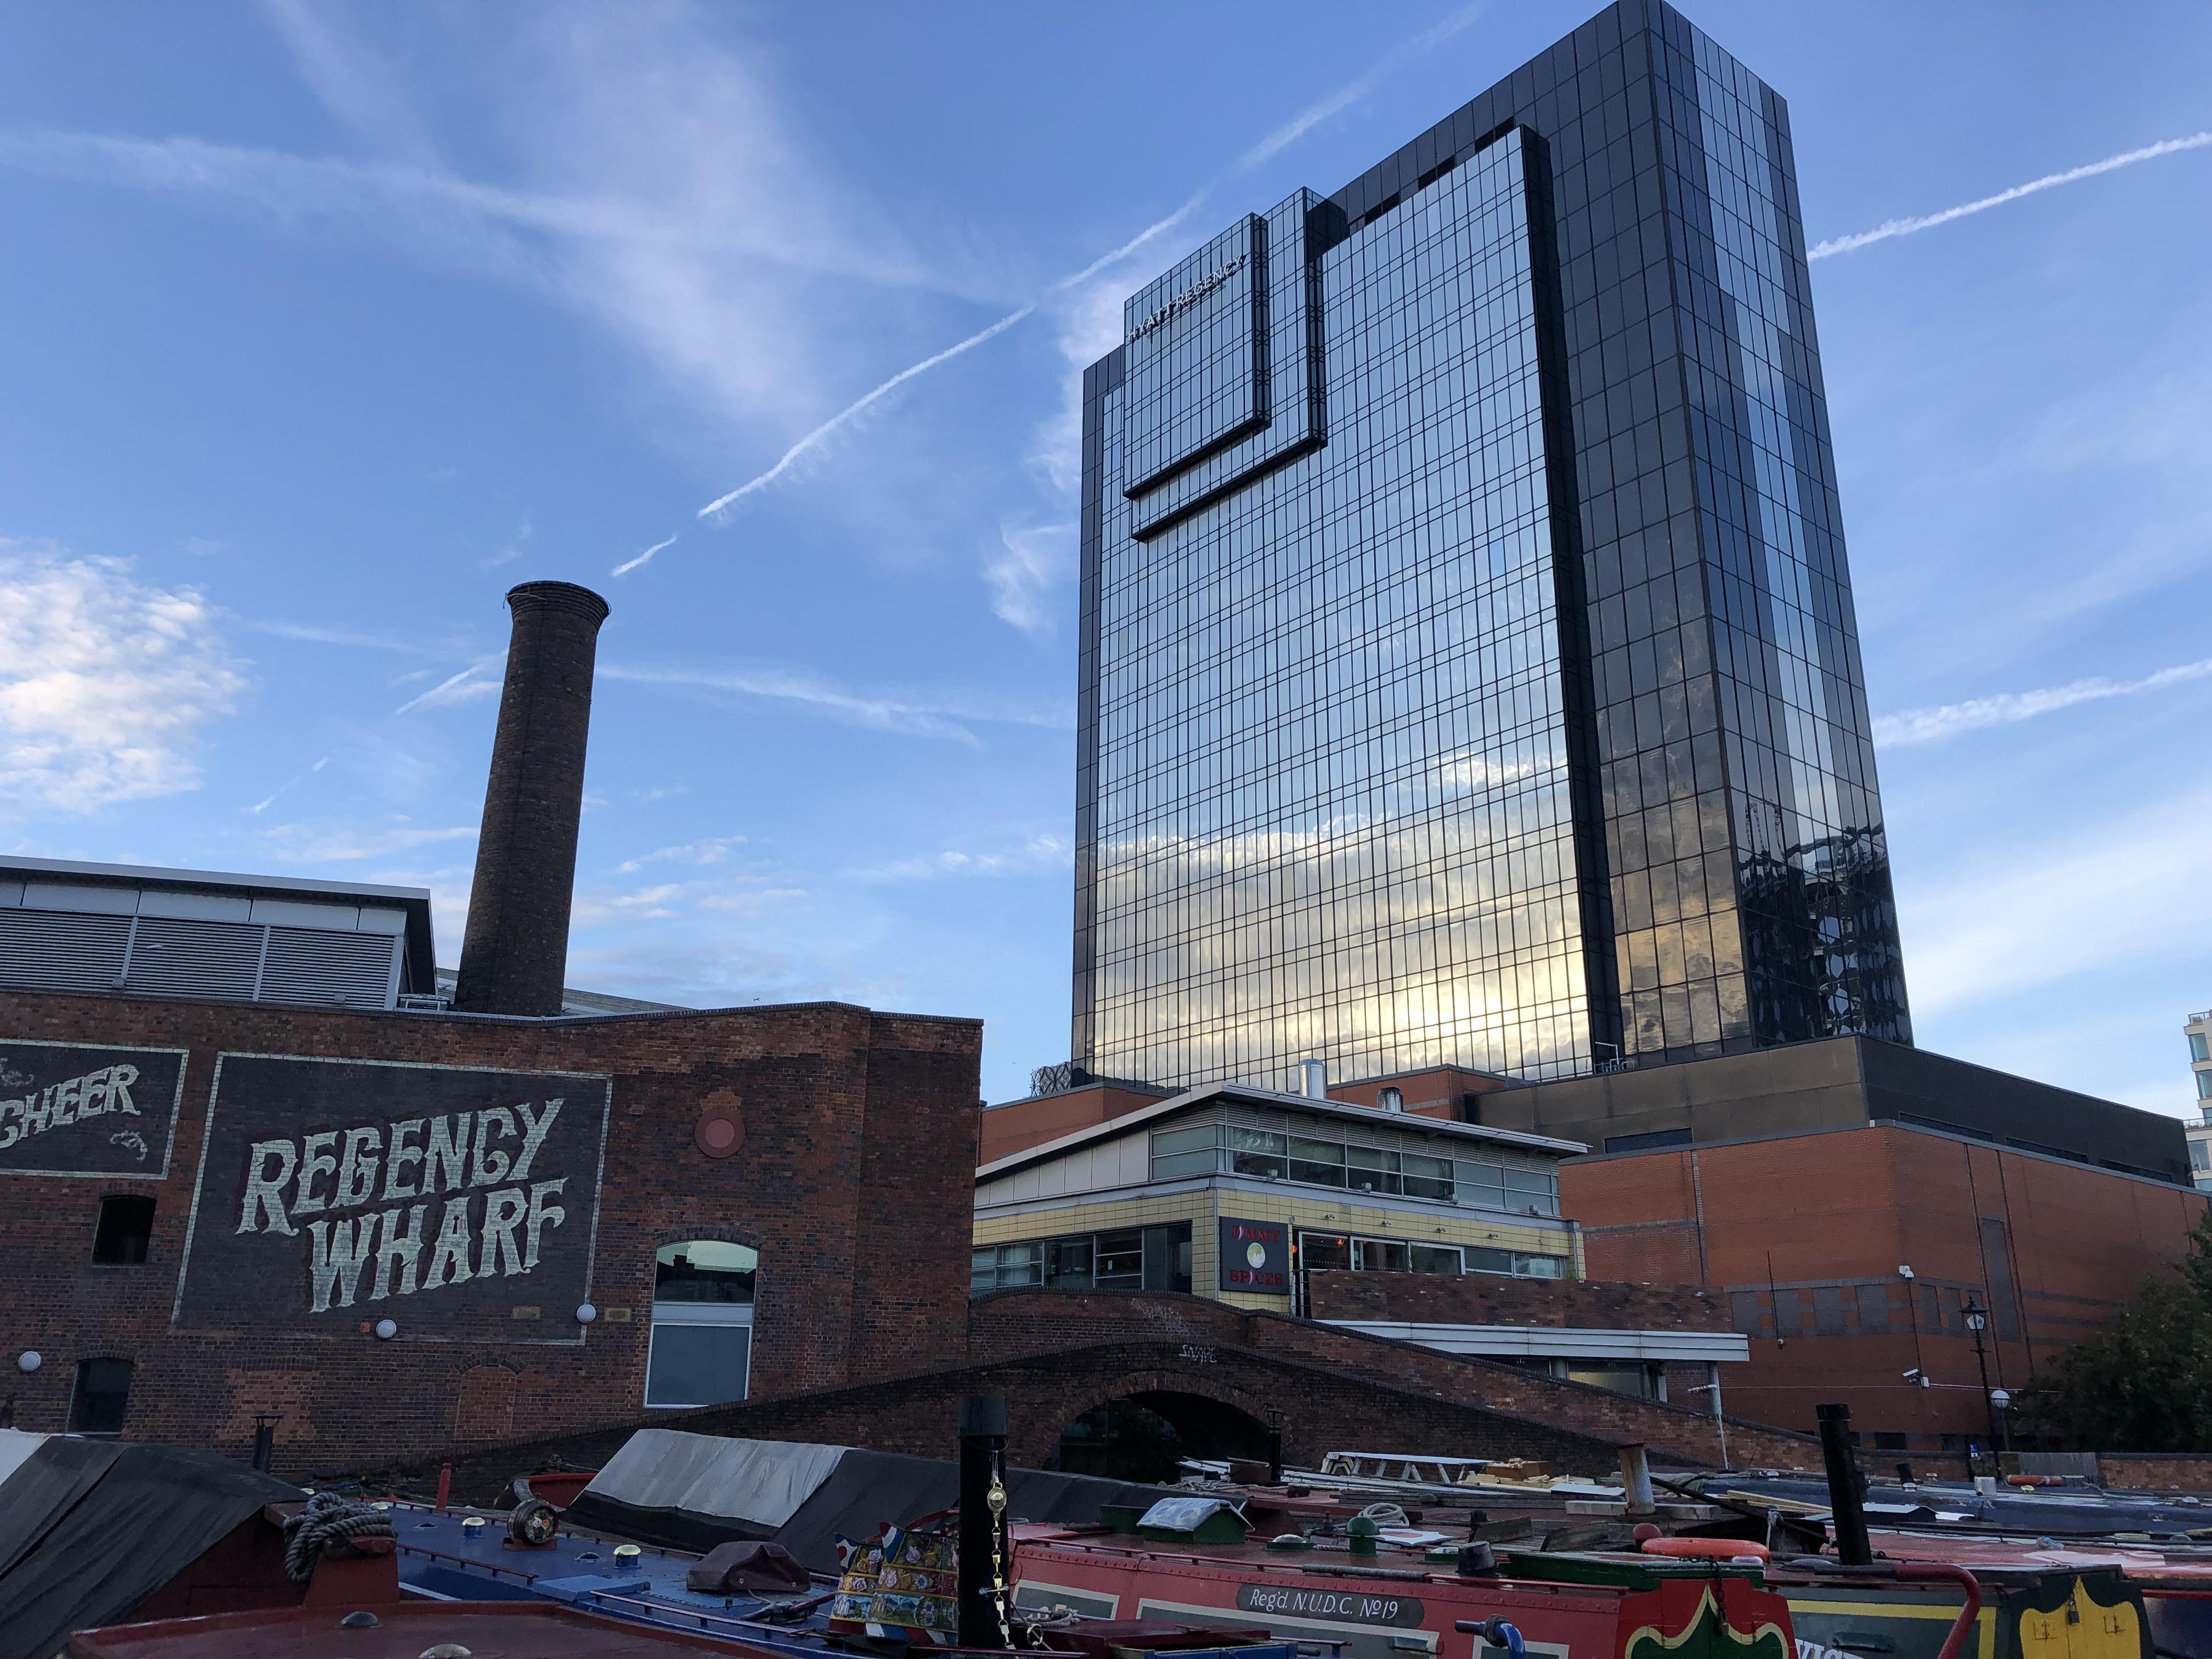 Regency Wharf, Birmingham